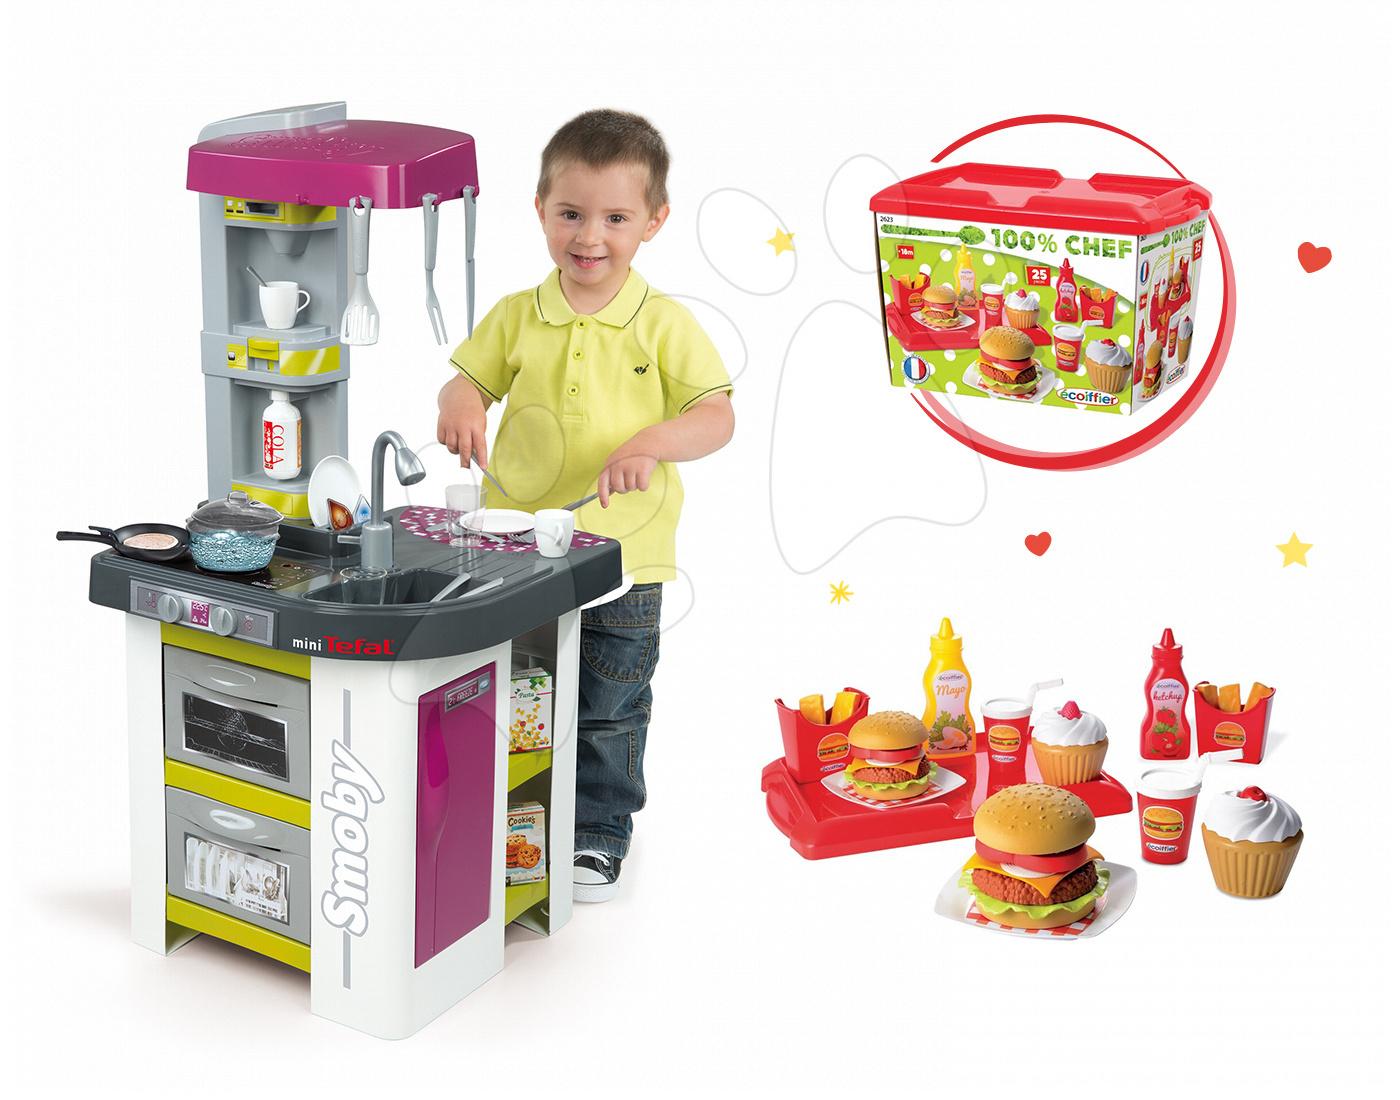 Smoby detská kuchynka Tefal Studio Barbecue a Écoiffier sada hamburgerov 311027-22